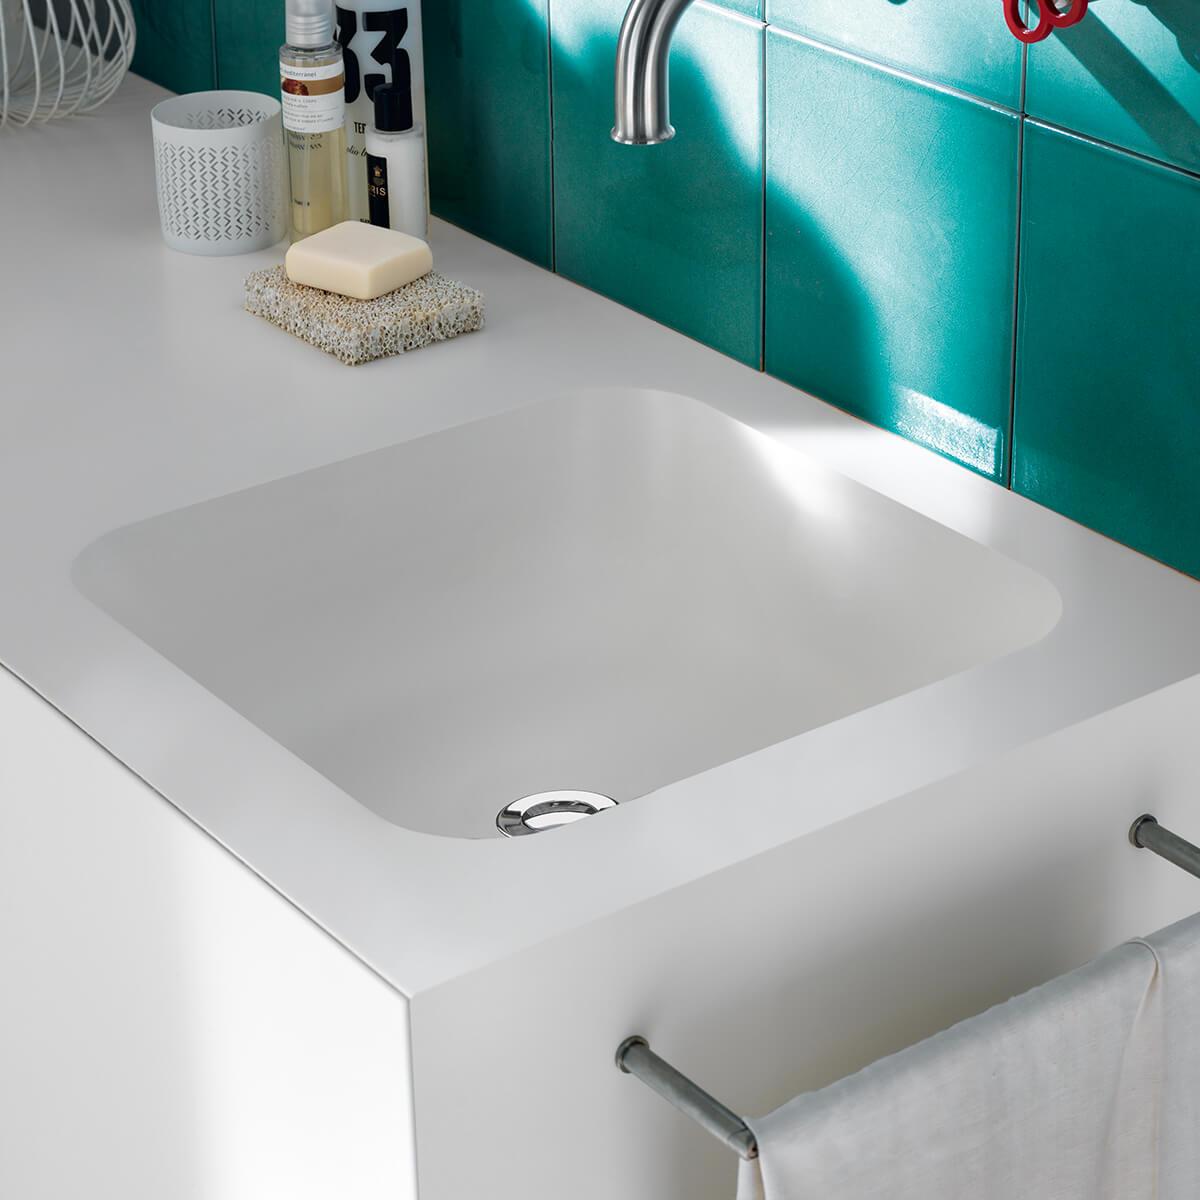 CASF corian basin serenity 8510 bathroom